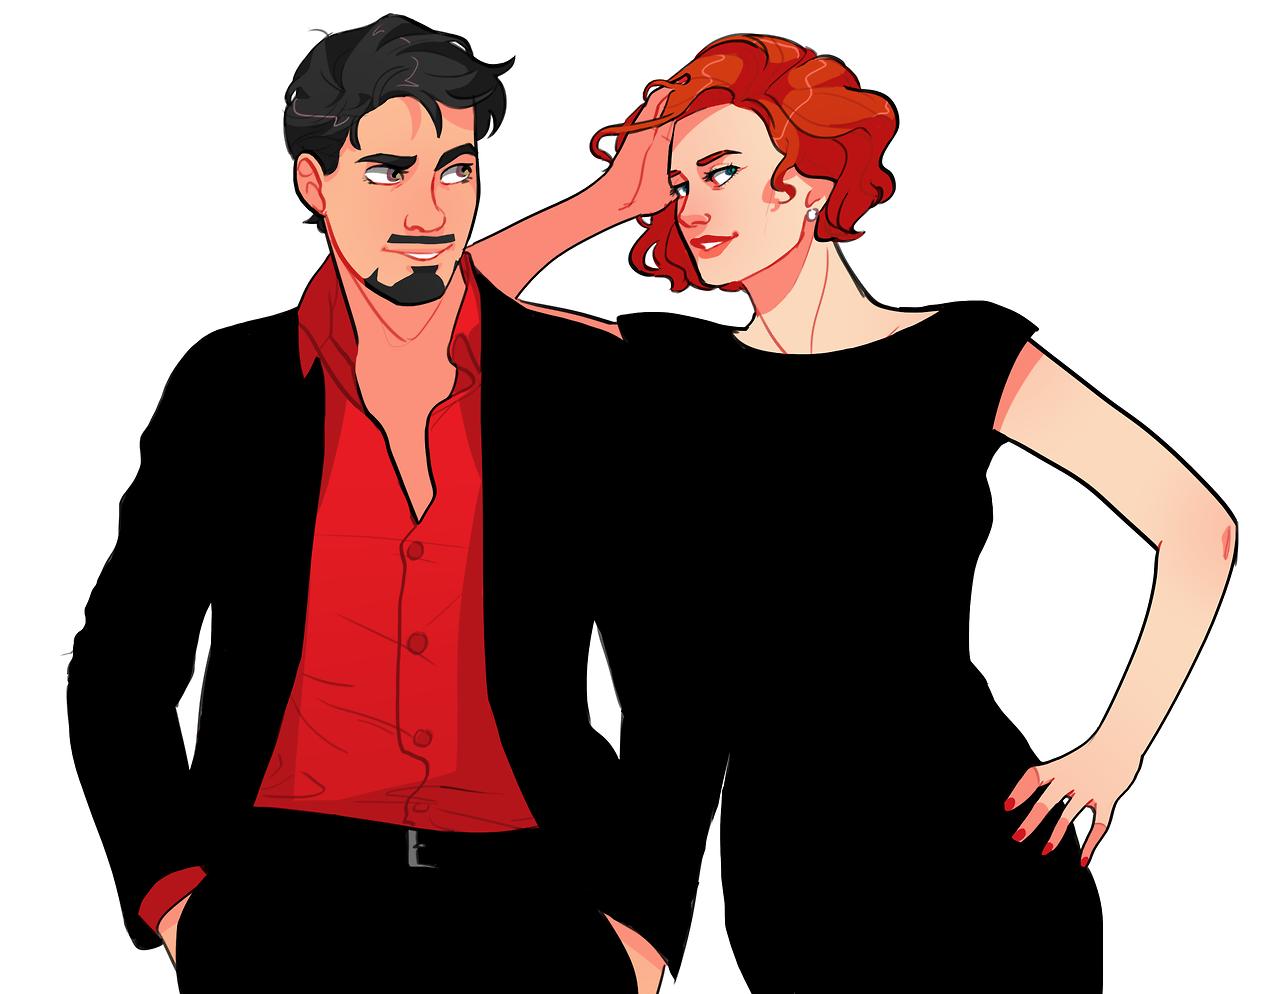 Stark and Romanoff